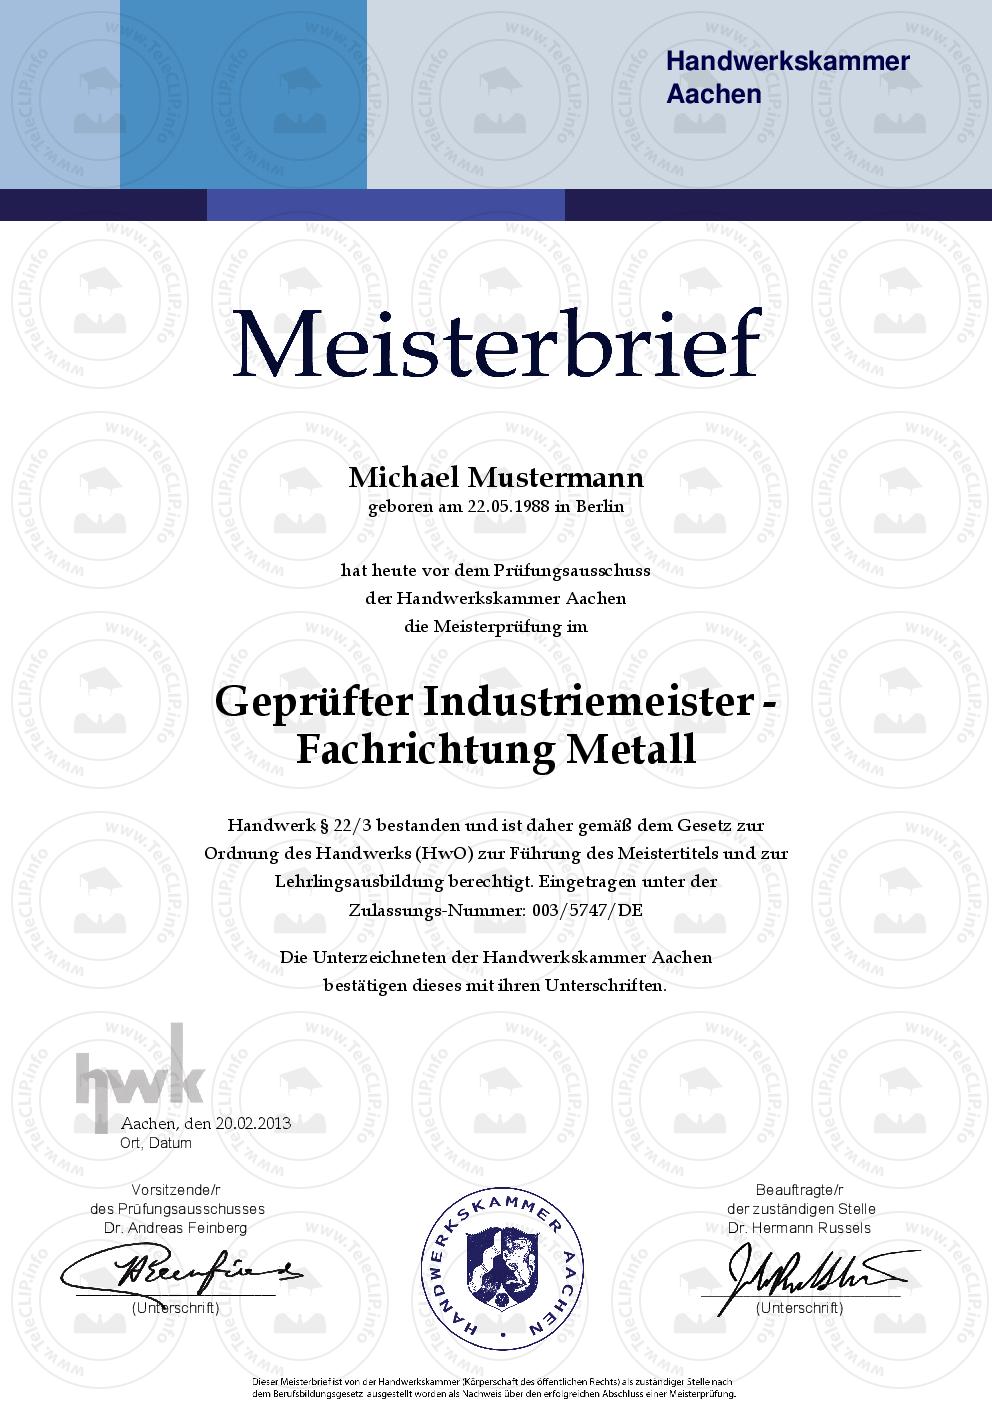 hwk_meisterbrief_7